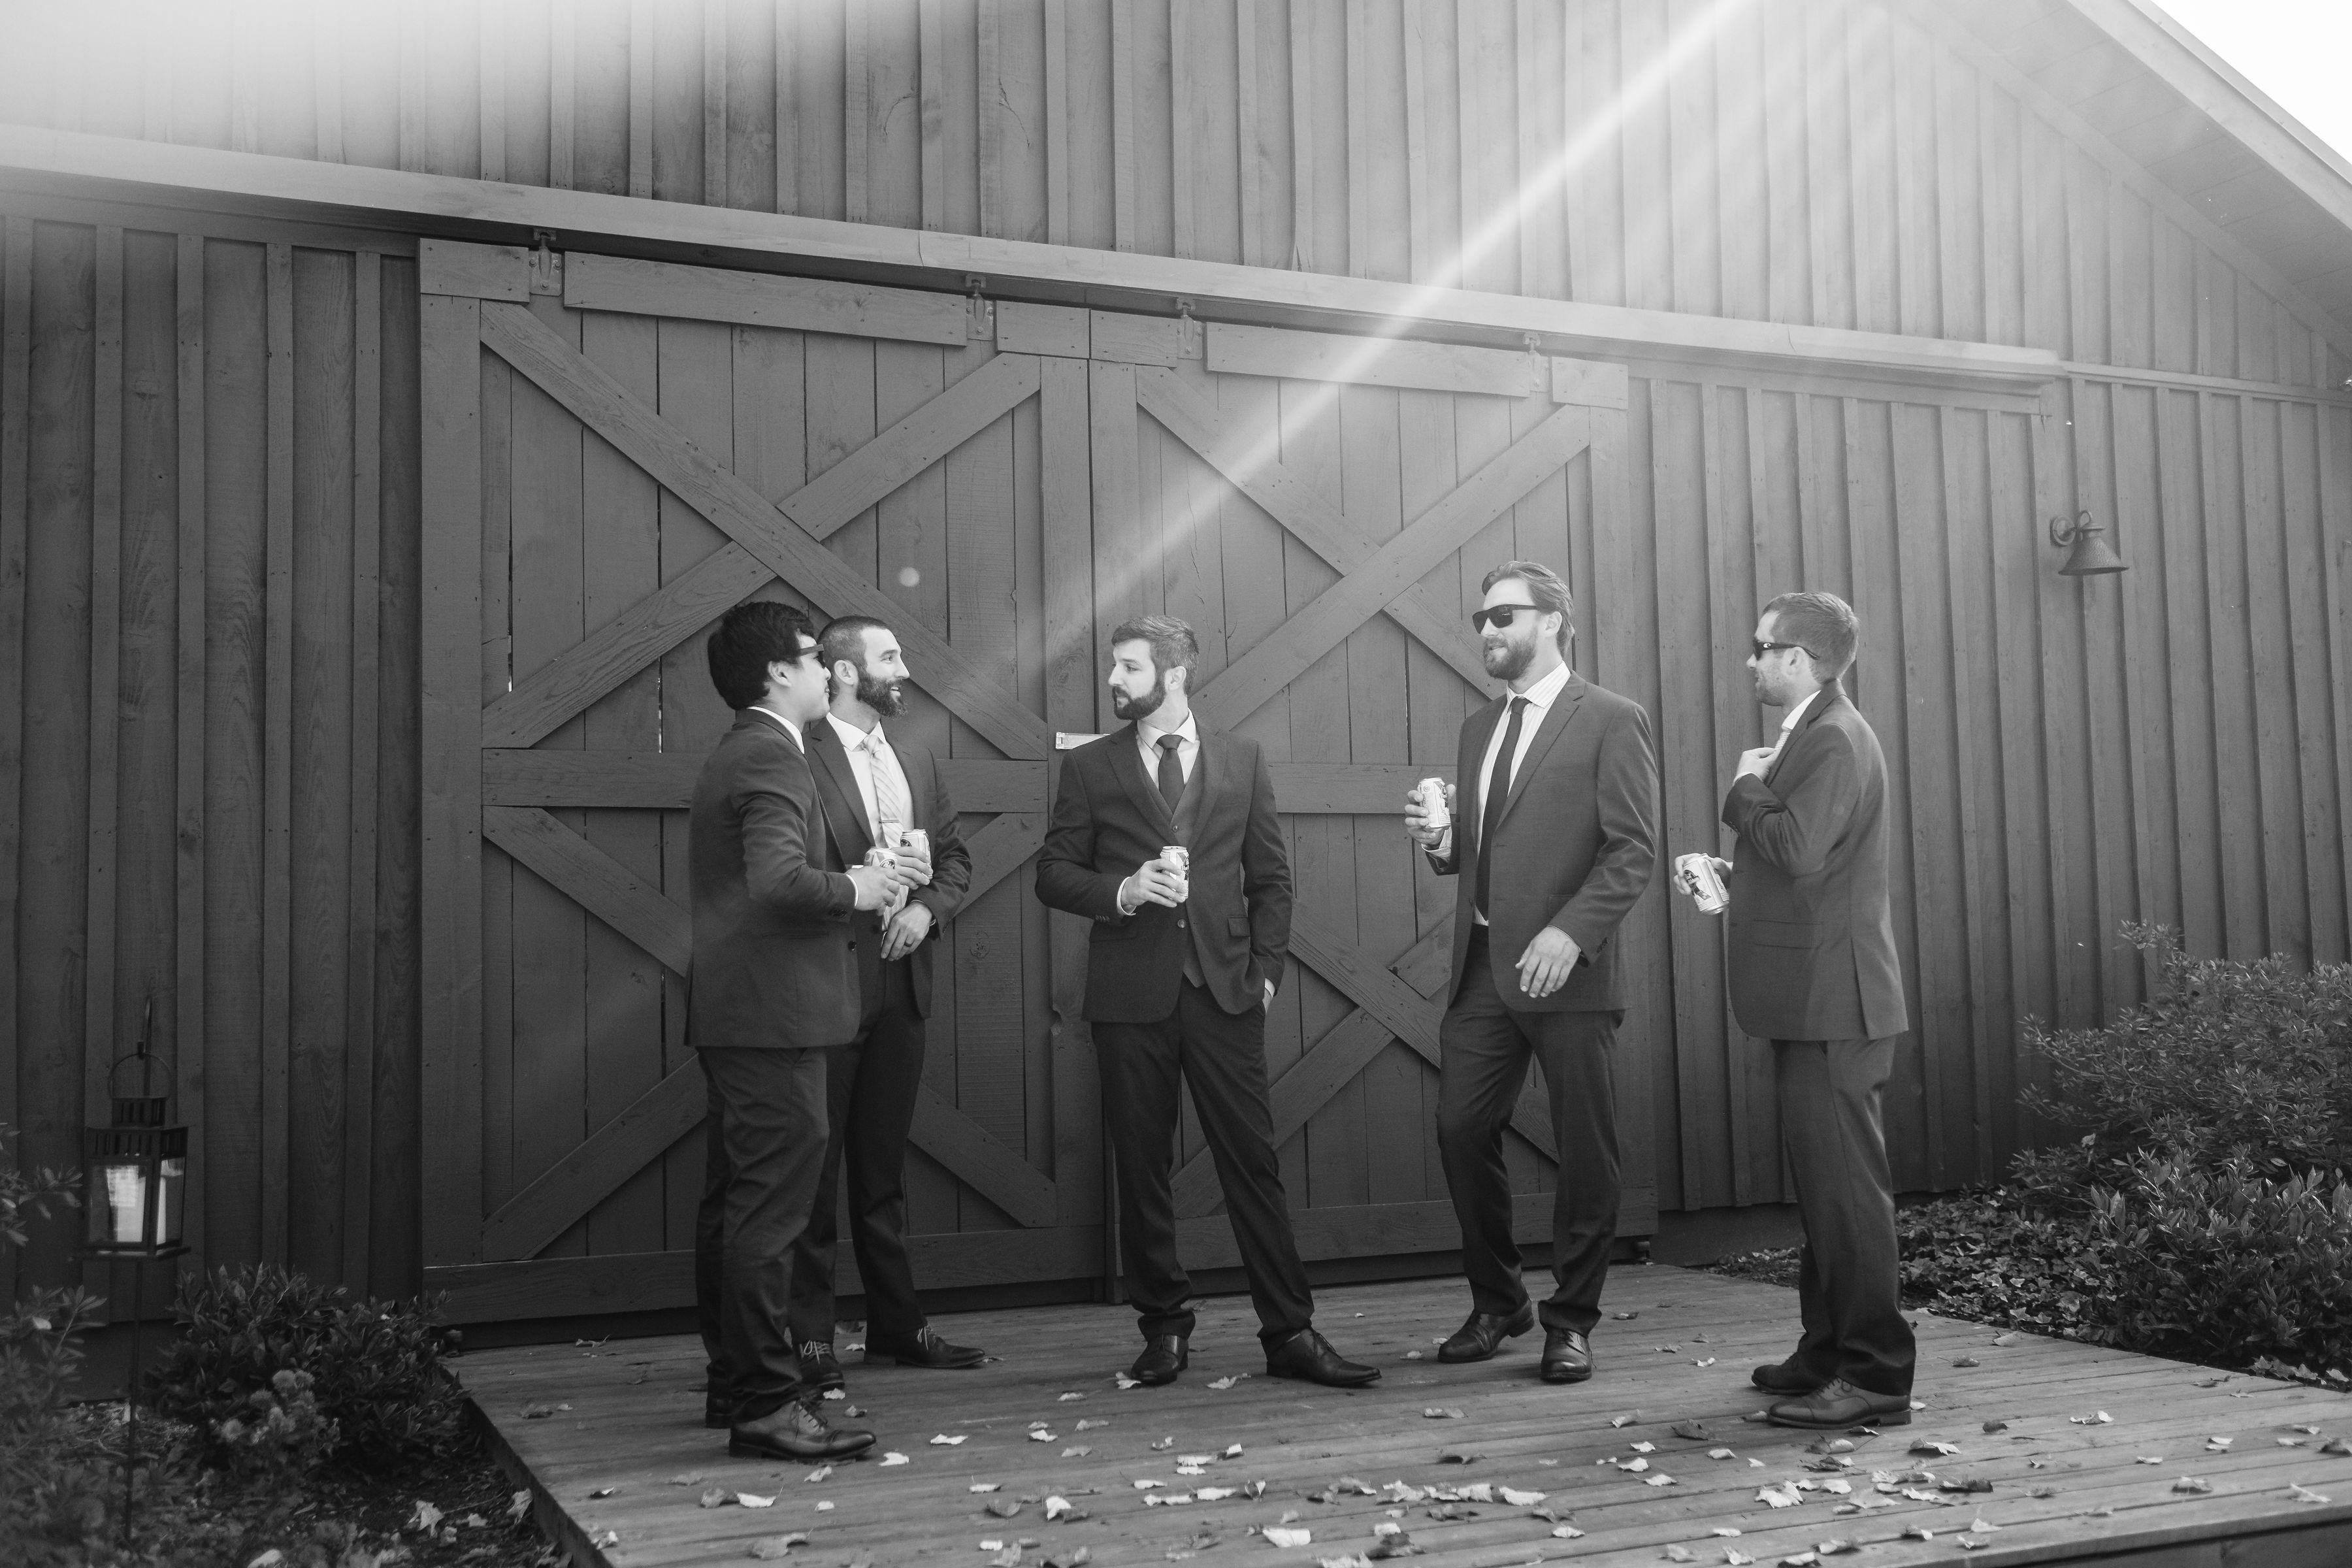 the men in black wedding photo groomsmen hold my beer